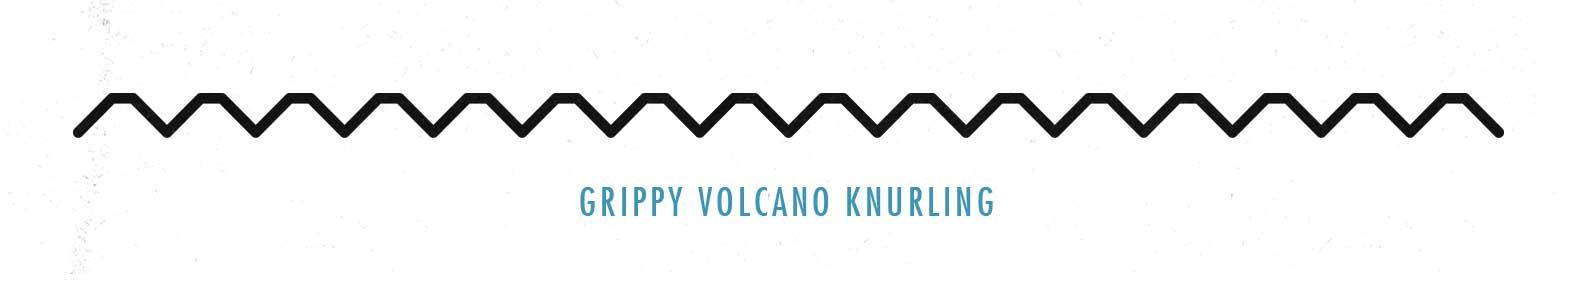 Grippy Volcano